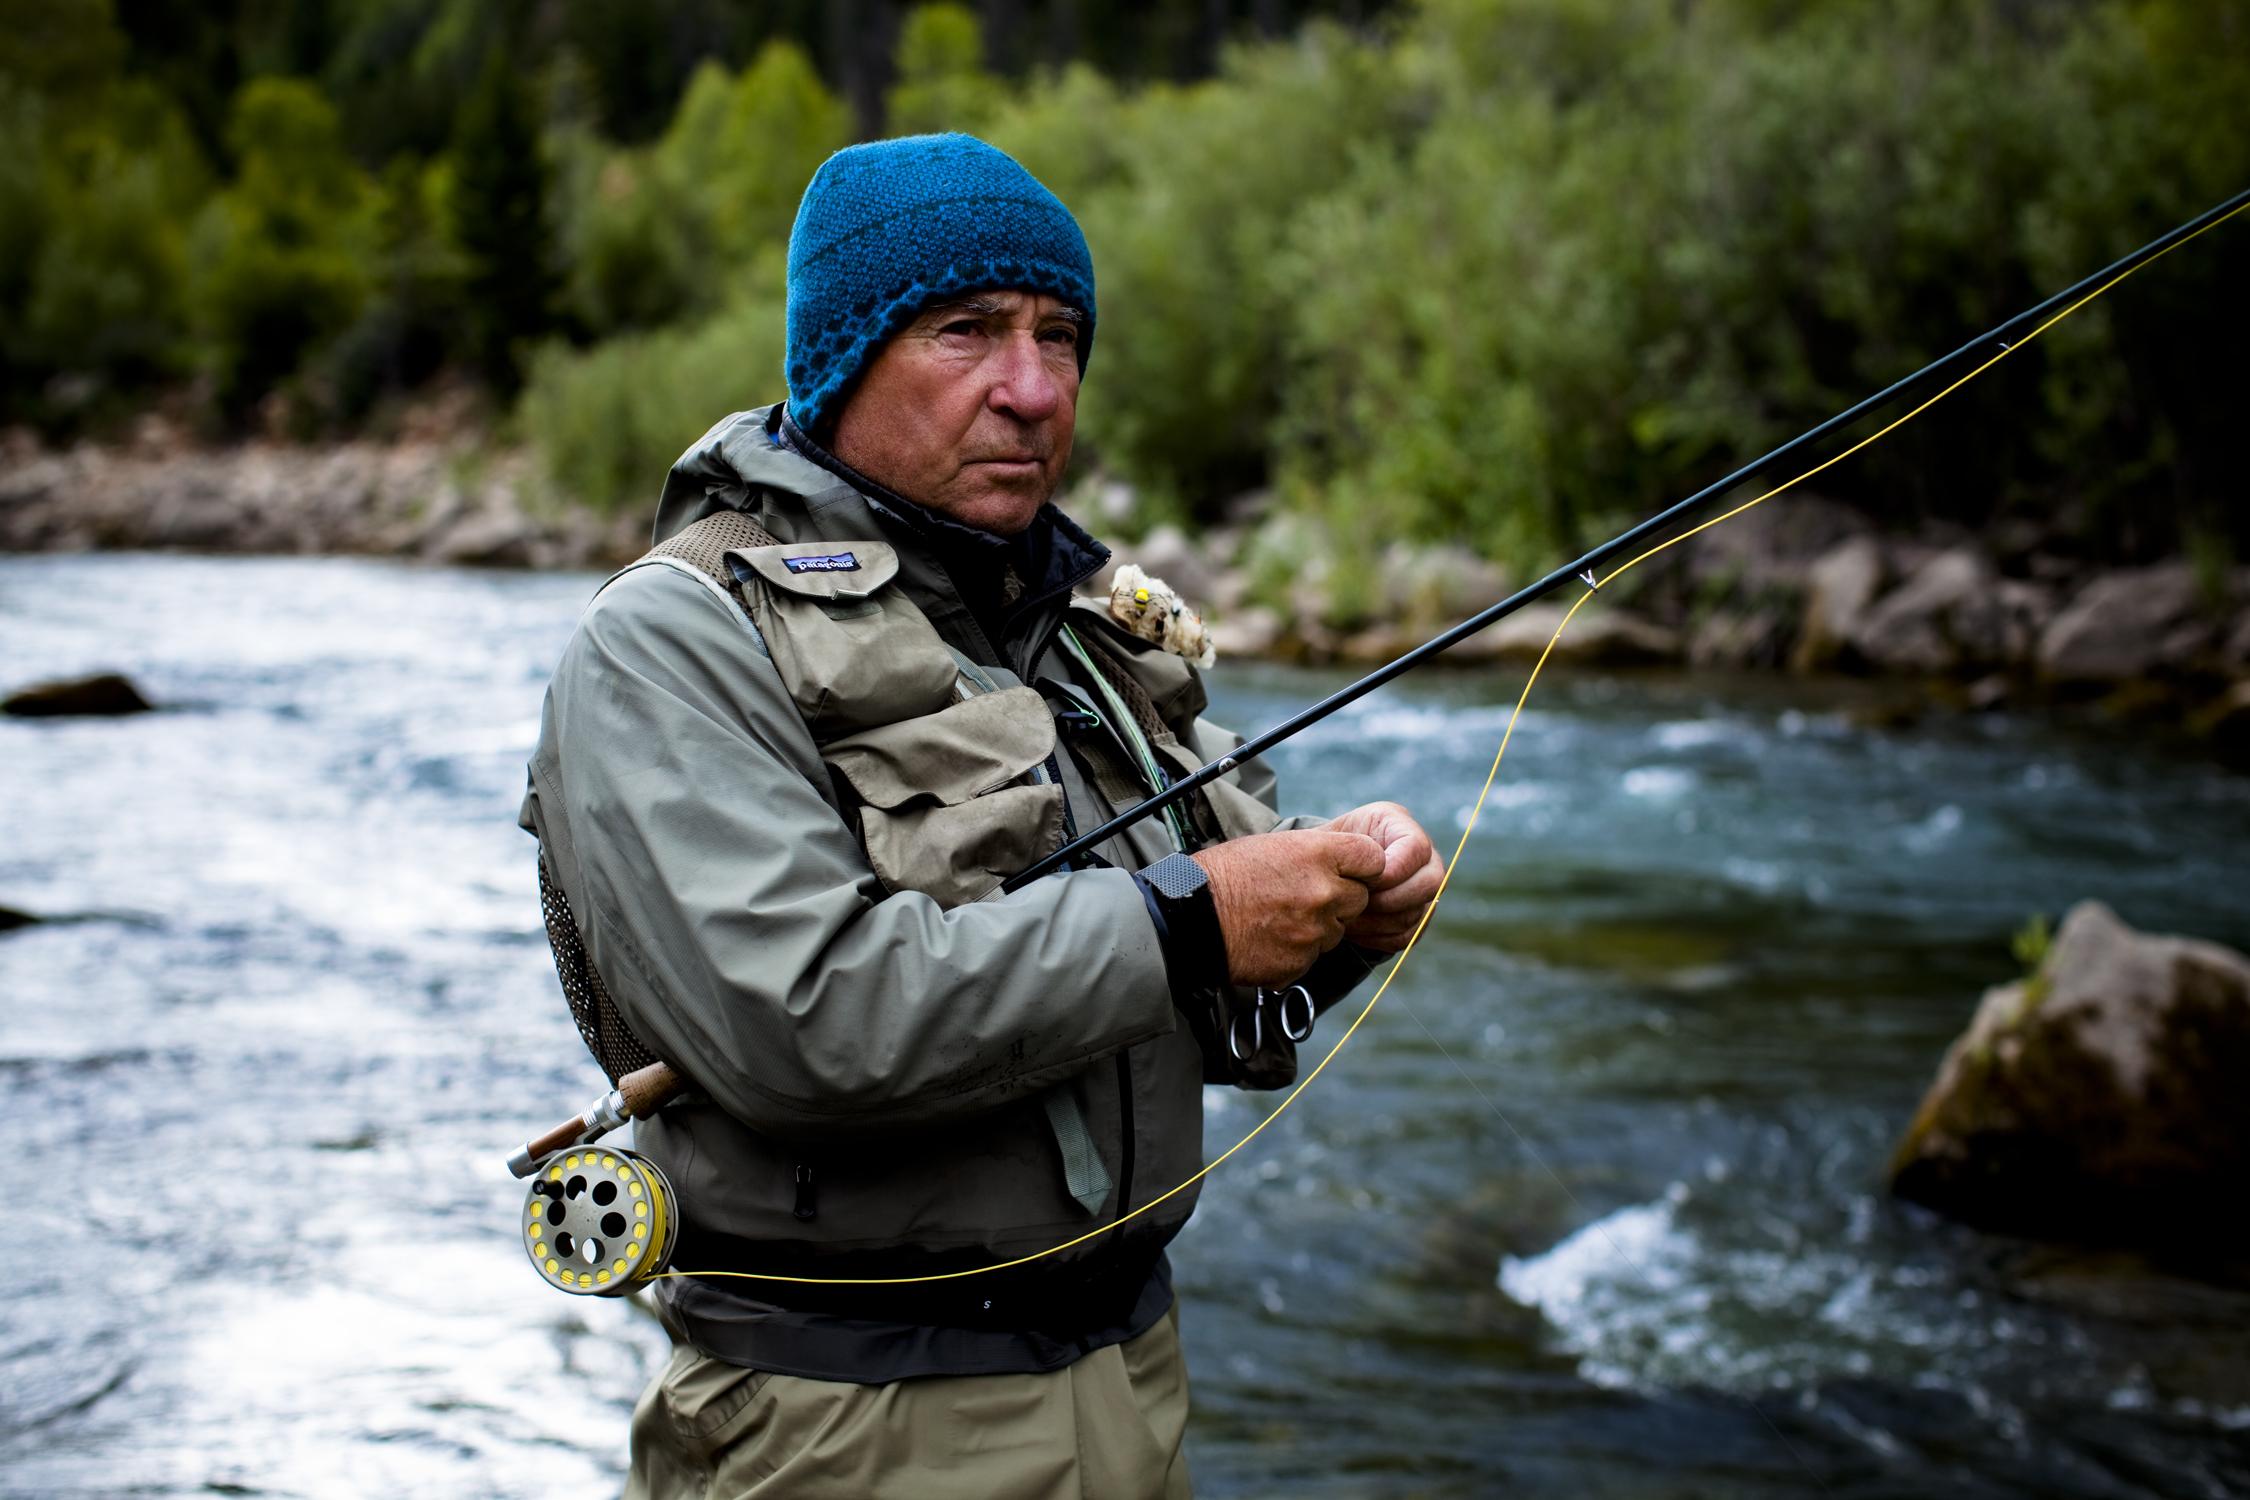 Photo of Patagonia's Yvon Chouinard fishing